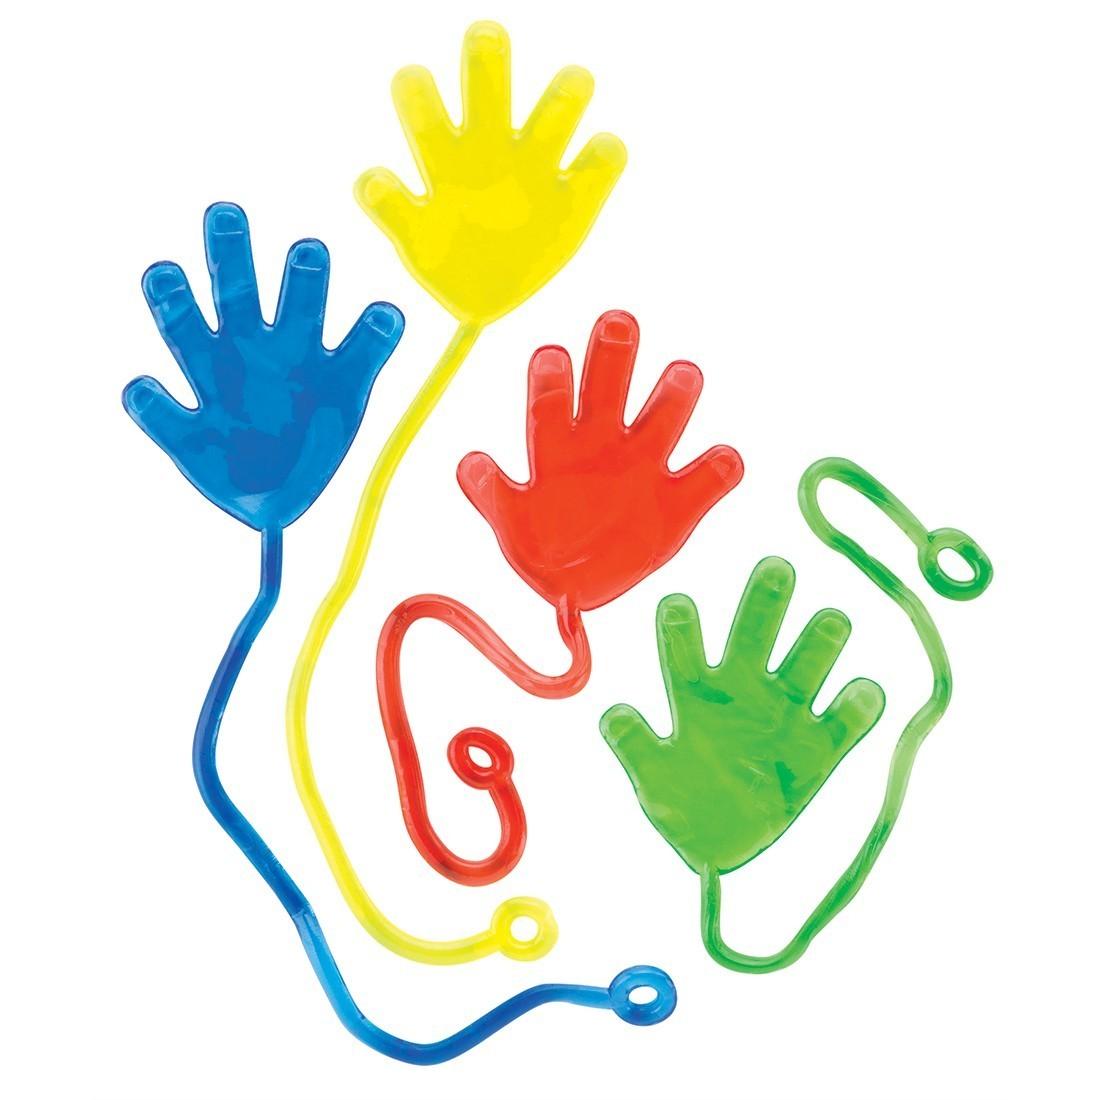 Sticky Hands [image]